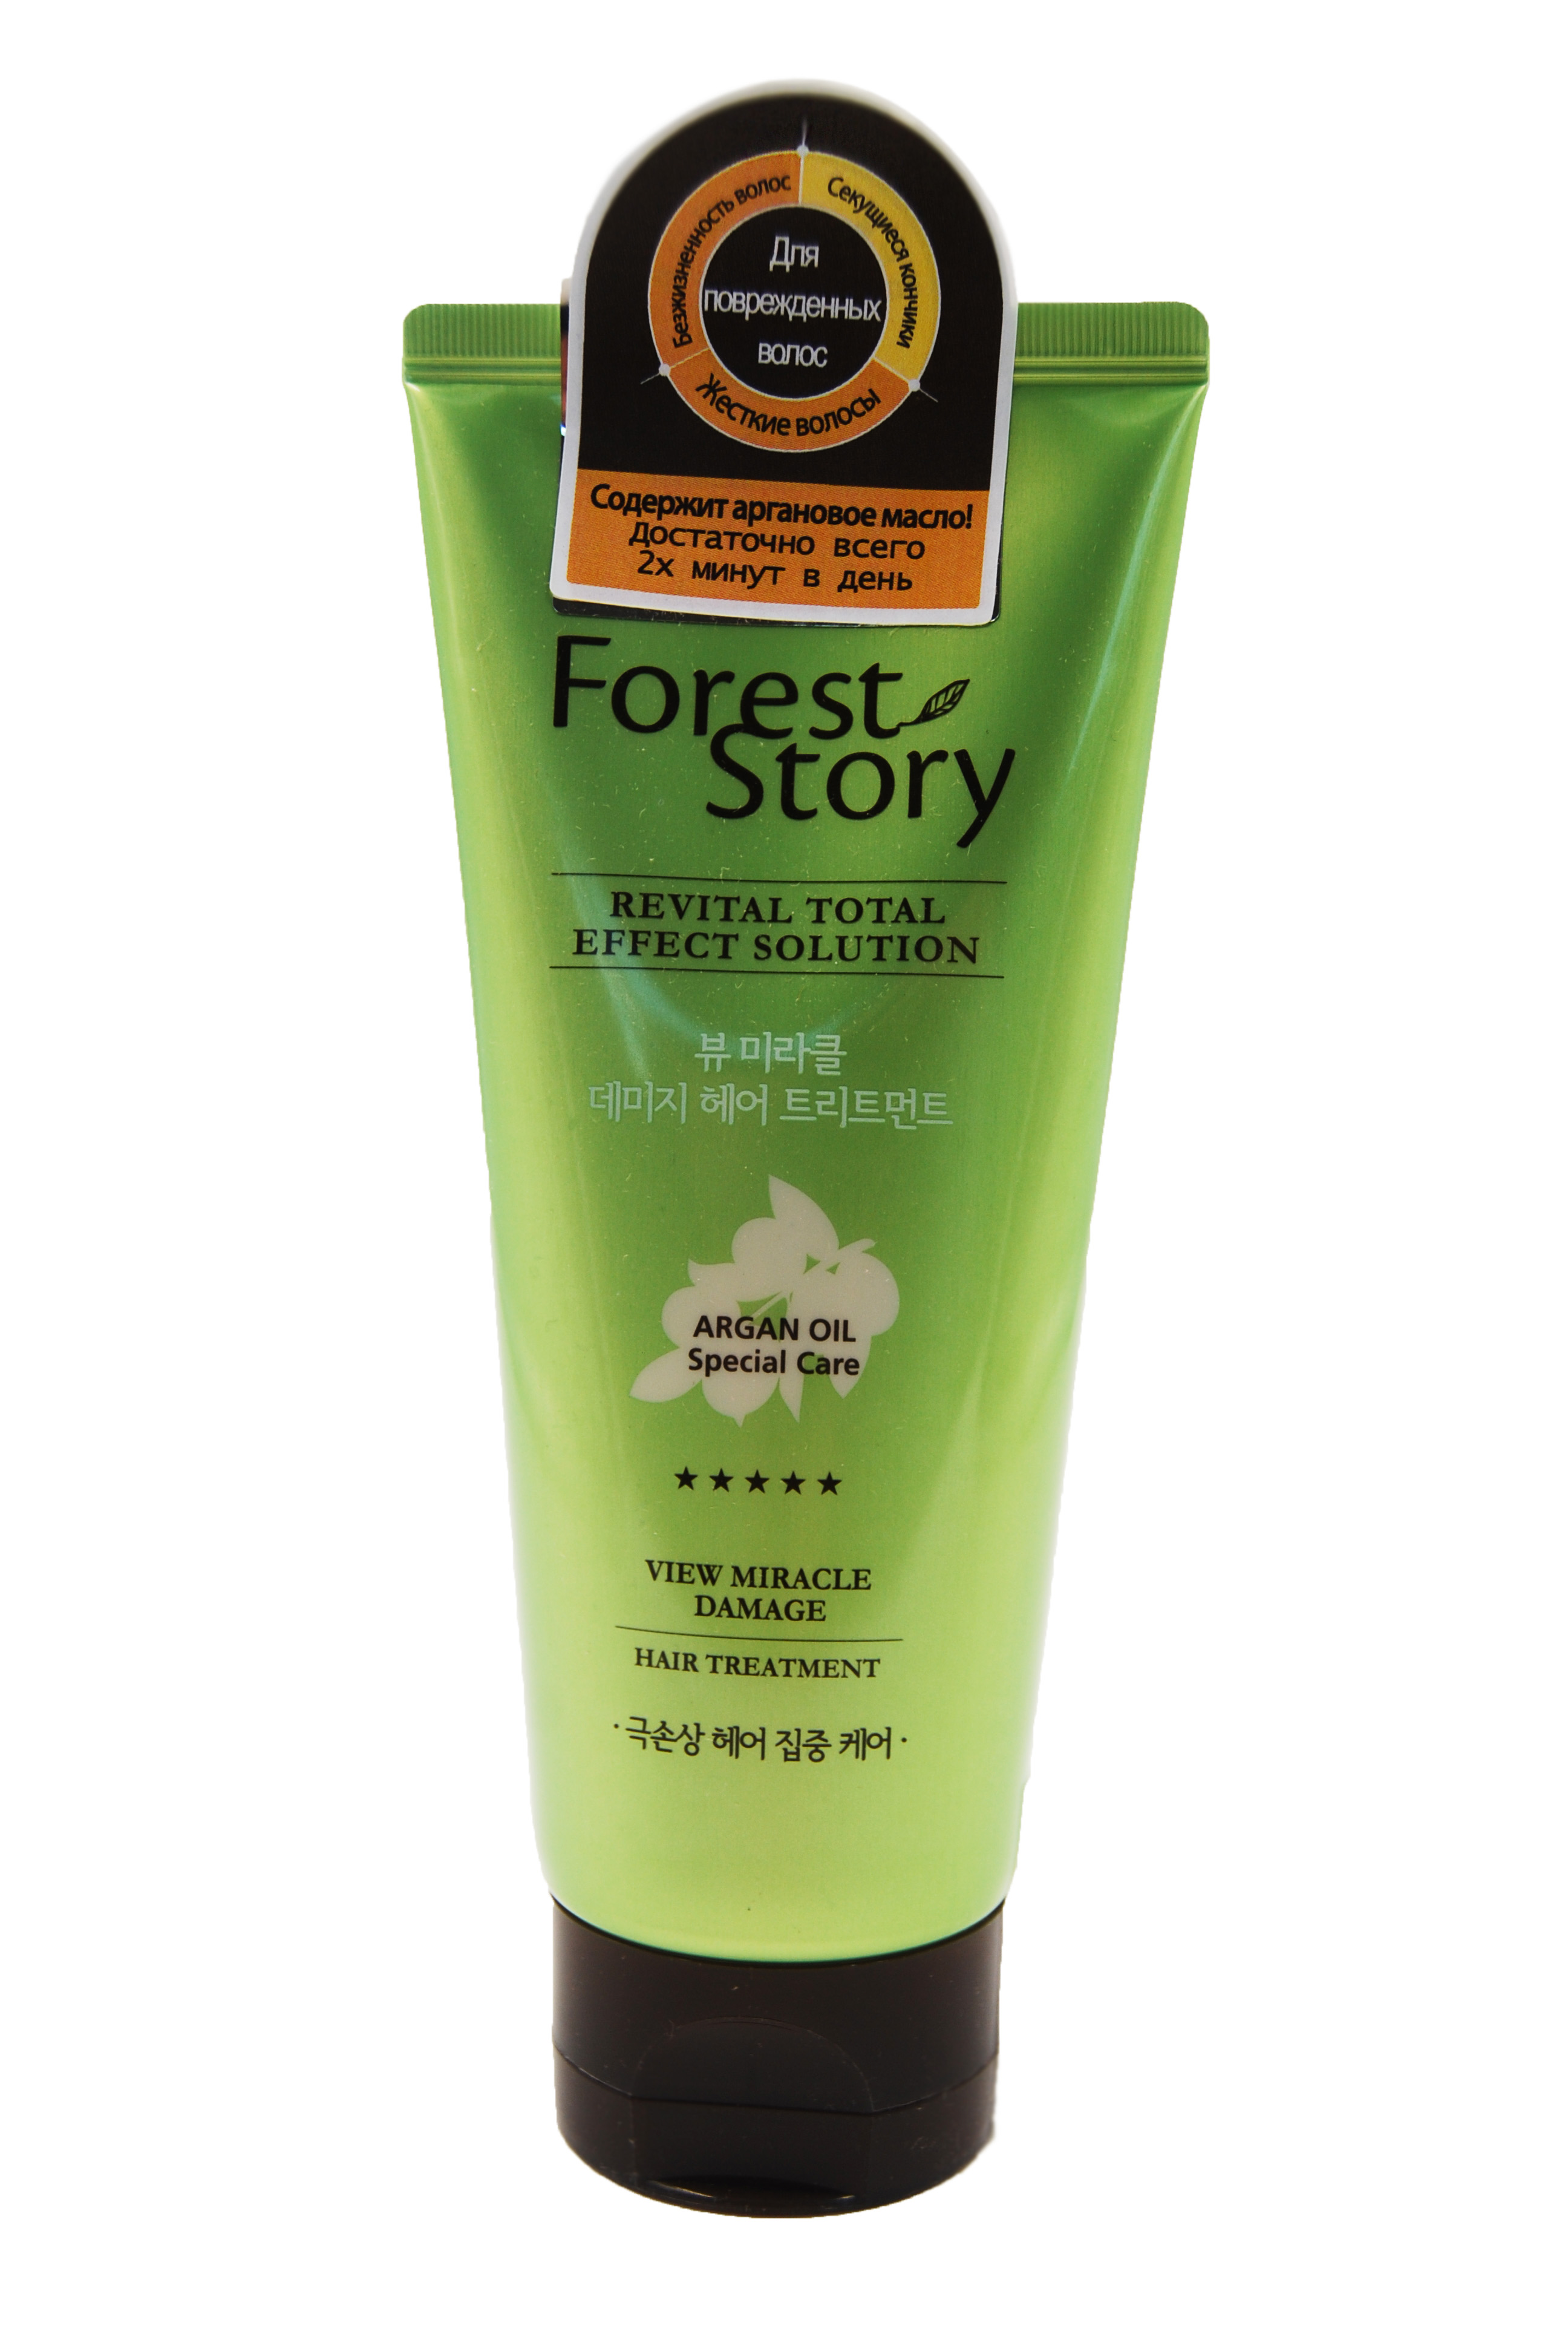 Купить Маска Forest Story View Miracle Damage Hair Trea для поврежденных волос 200 мл, [Forest Story] Маска для поврежденных волос с аргановым маслом, View Miracle Damage Hair Trea 200 мл